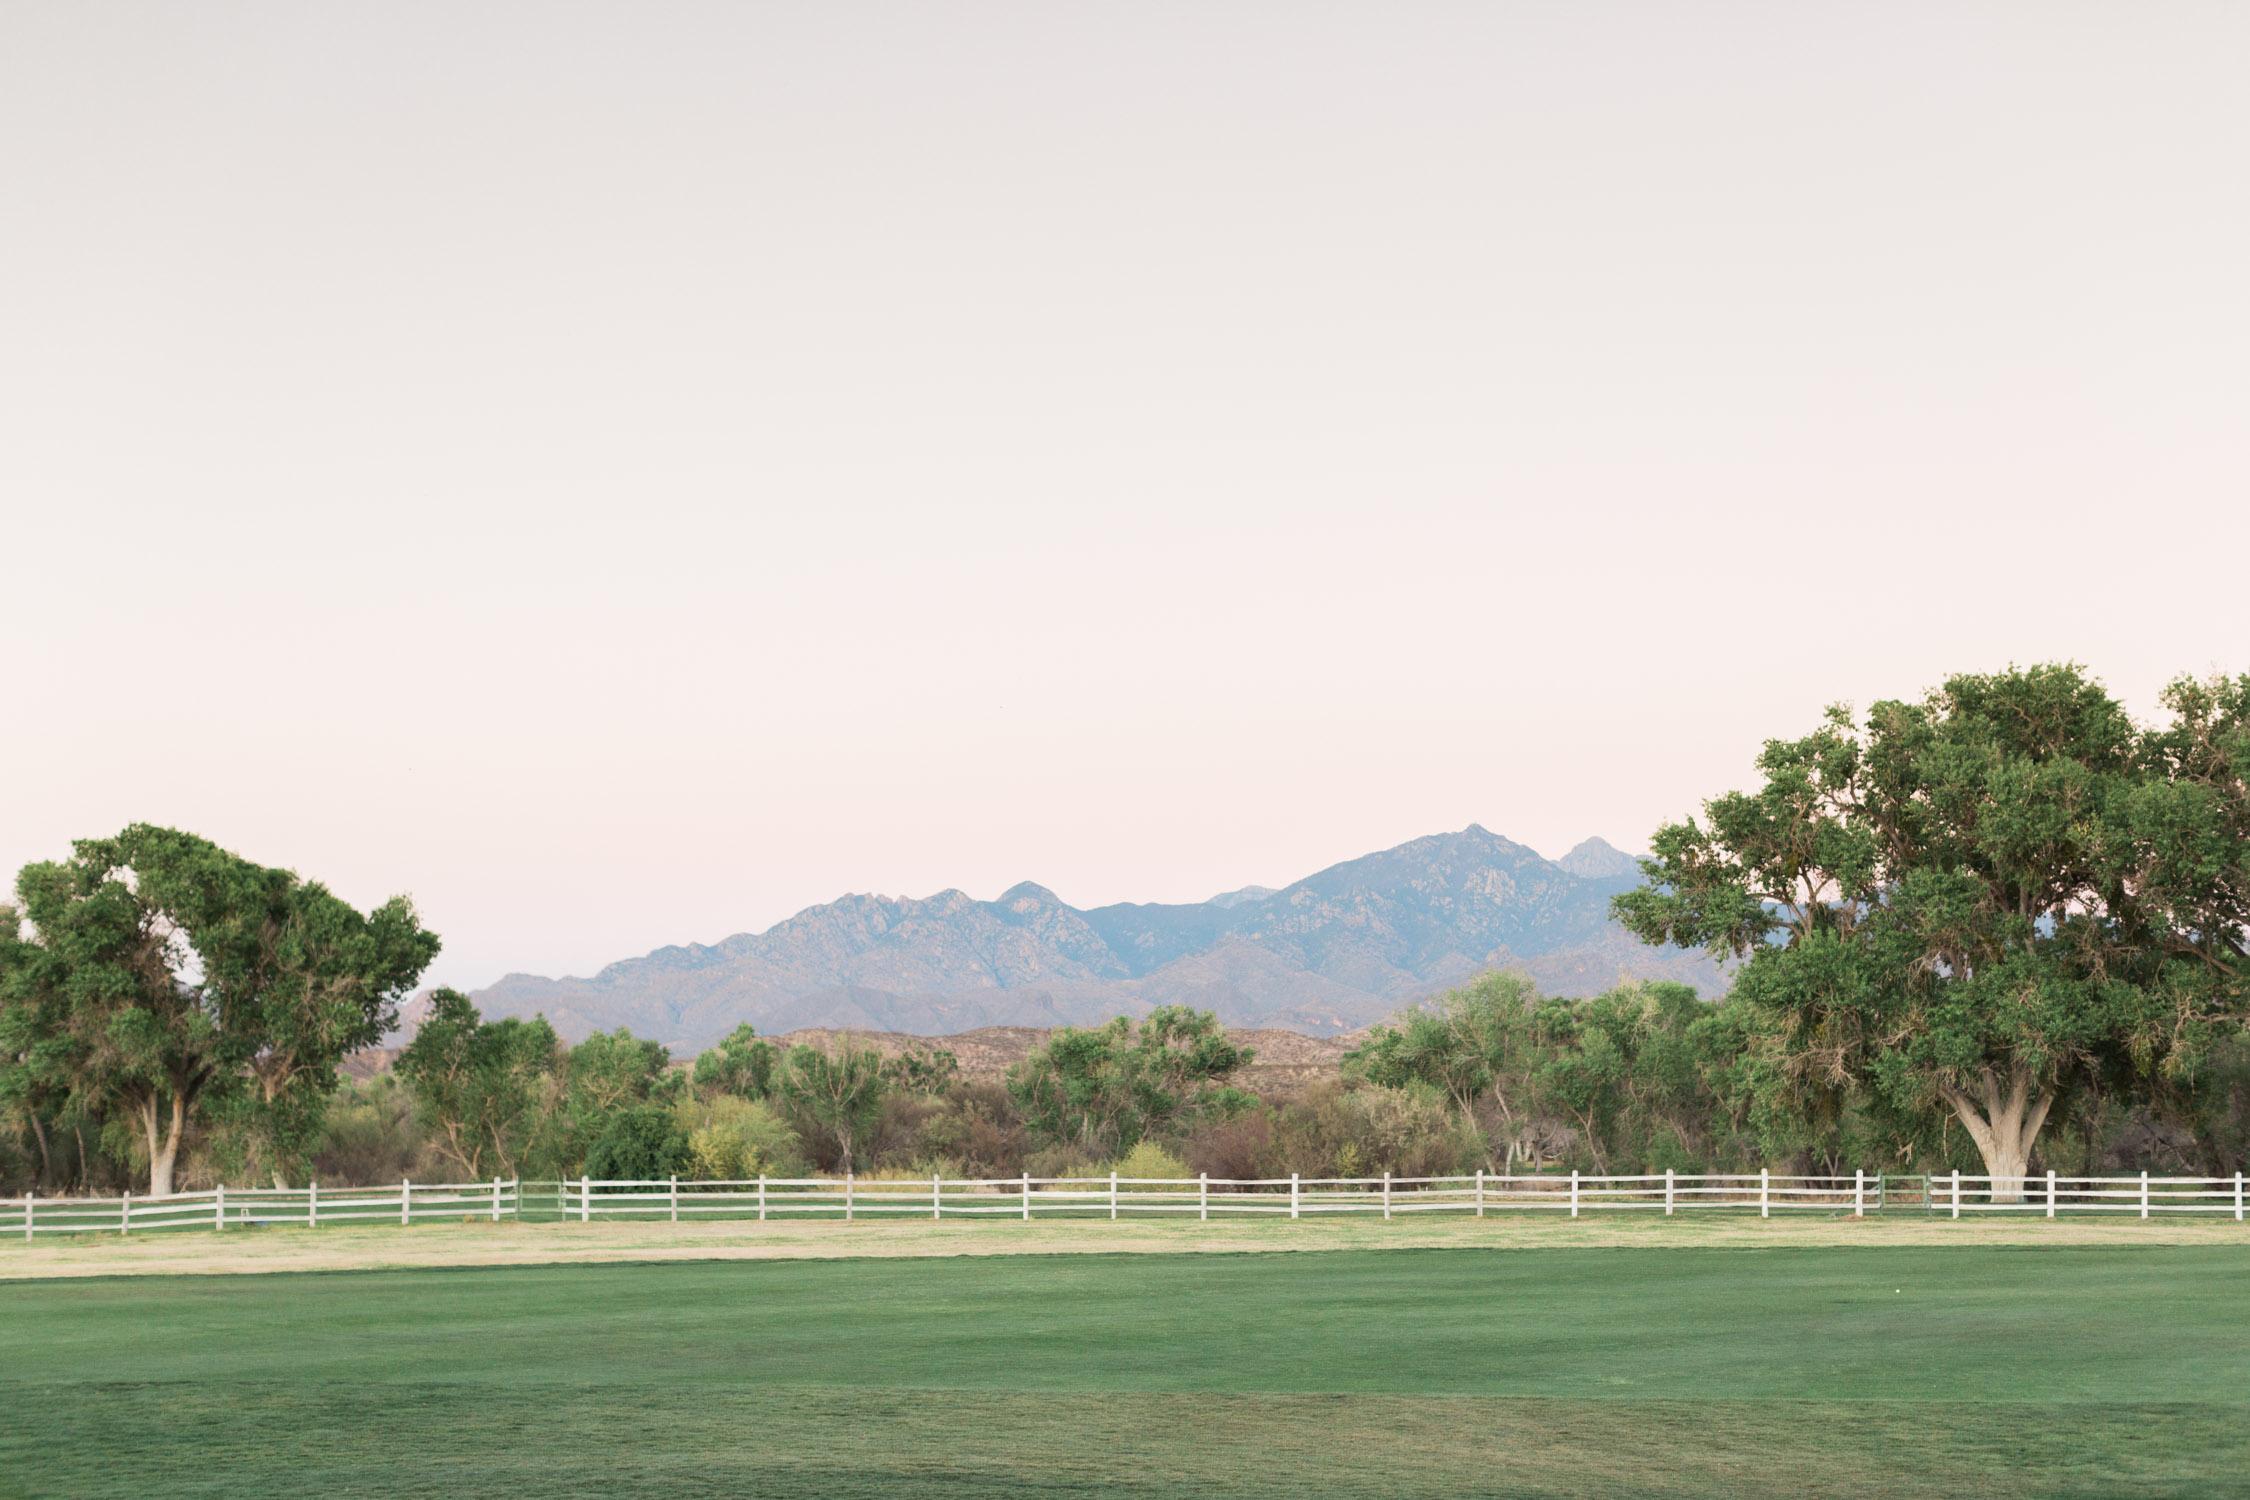 Beautiful views at Tubac Golf Resort for Alyssa & Dave's wedding planned by Rackel Ghelsen Weddings!